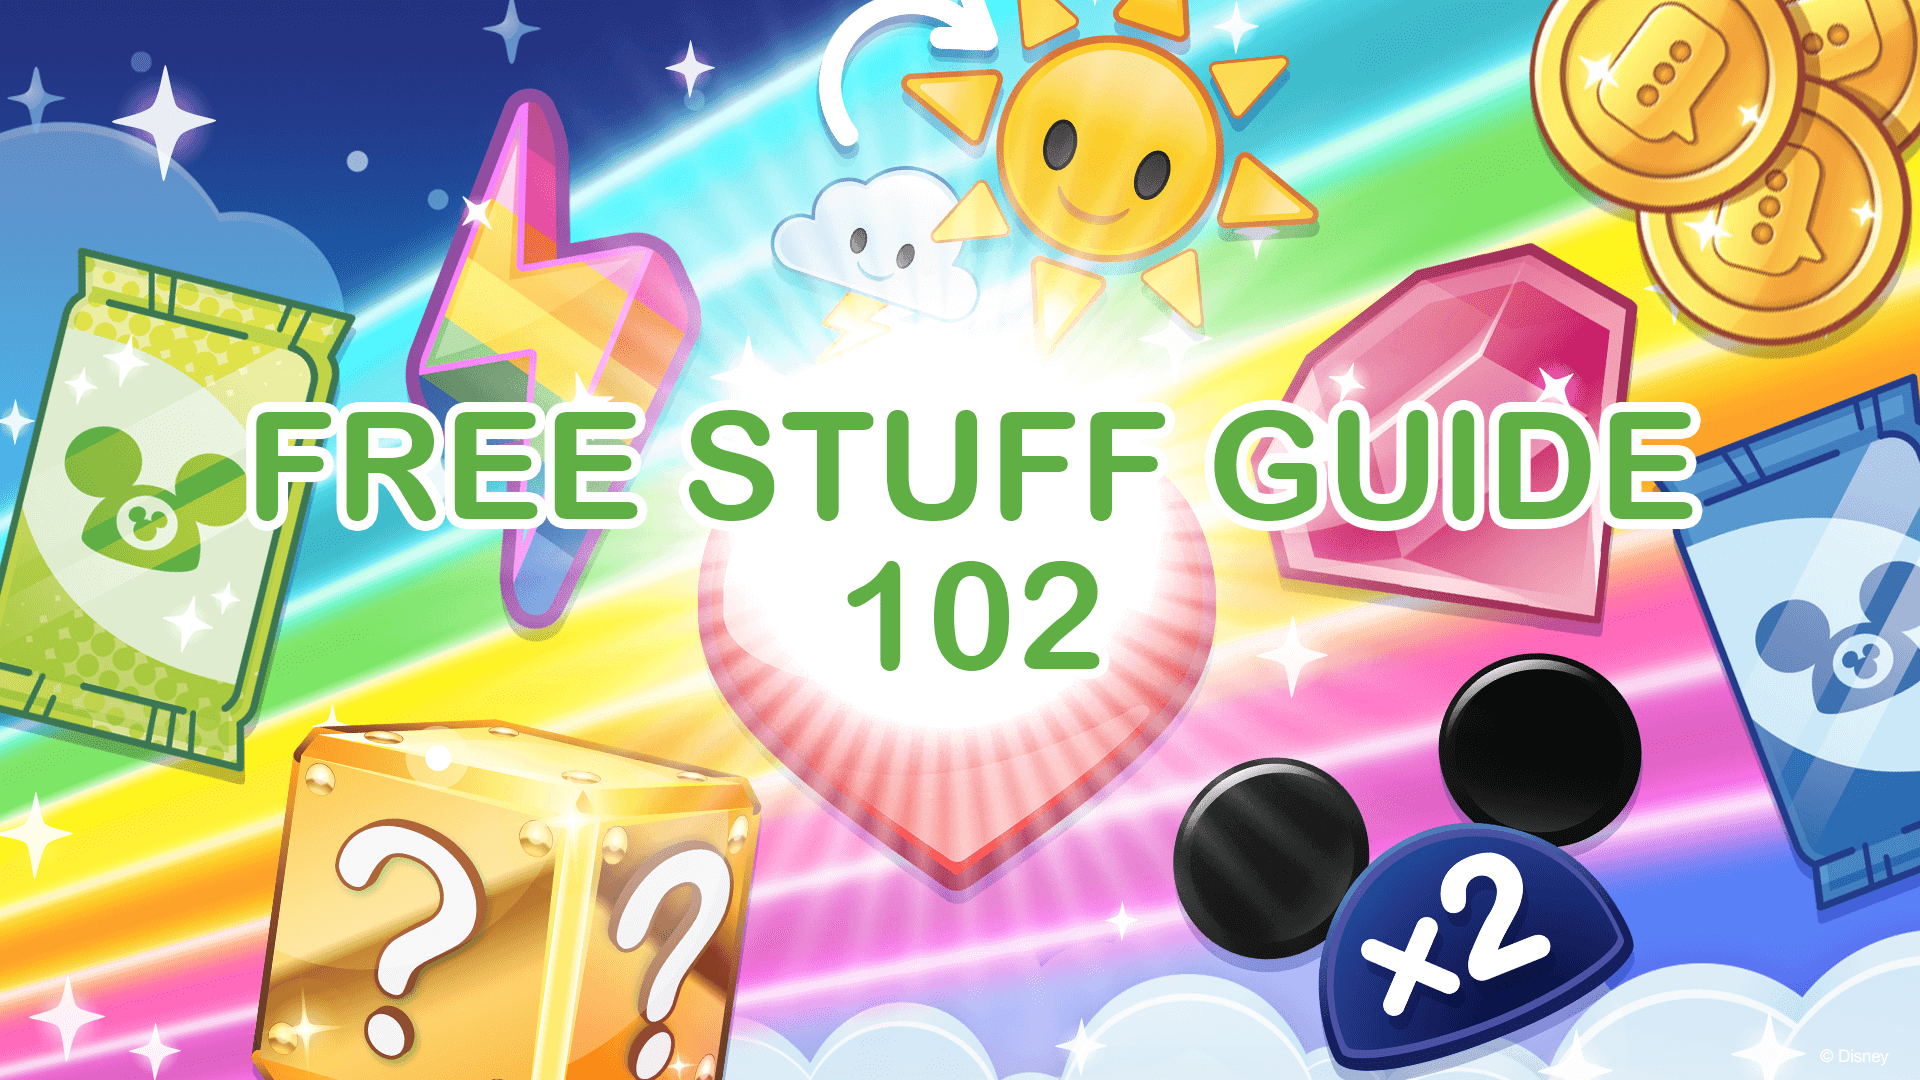 Free Stuff Guide 102